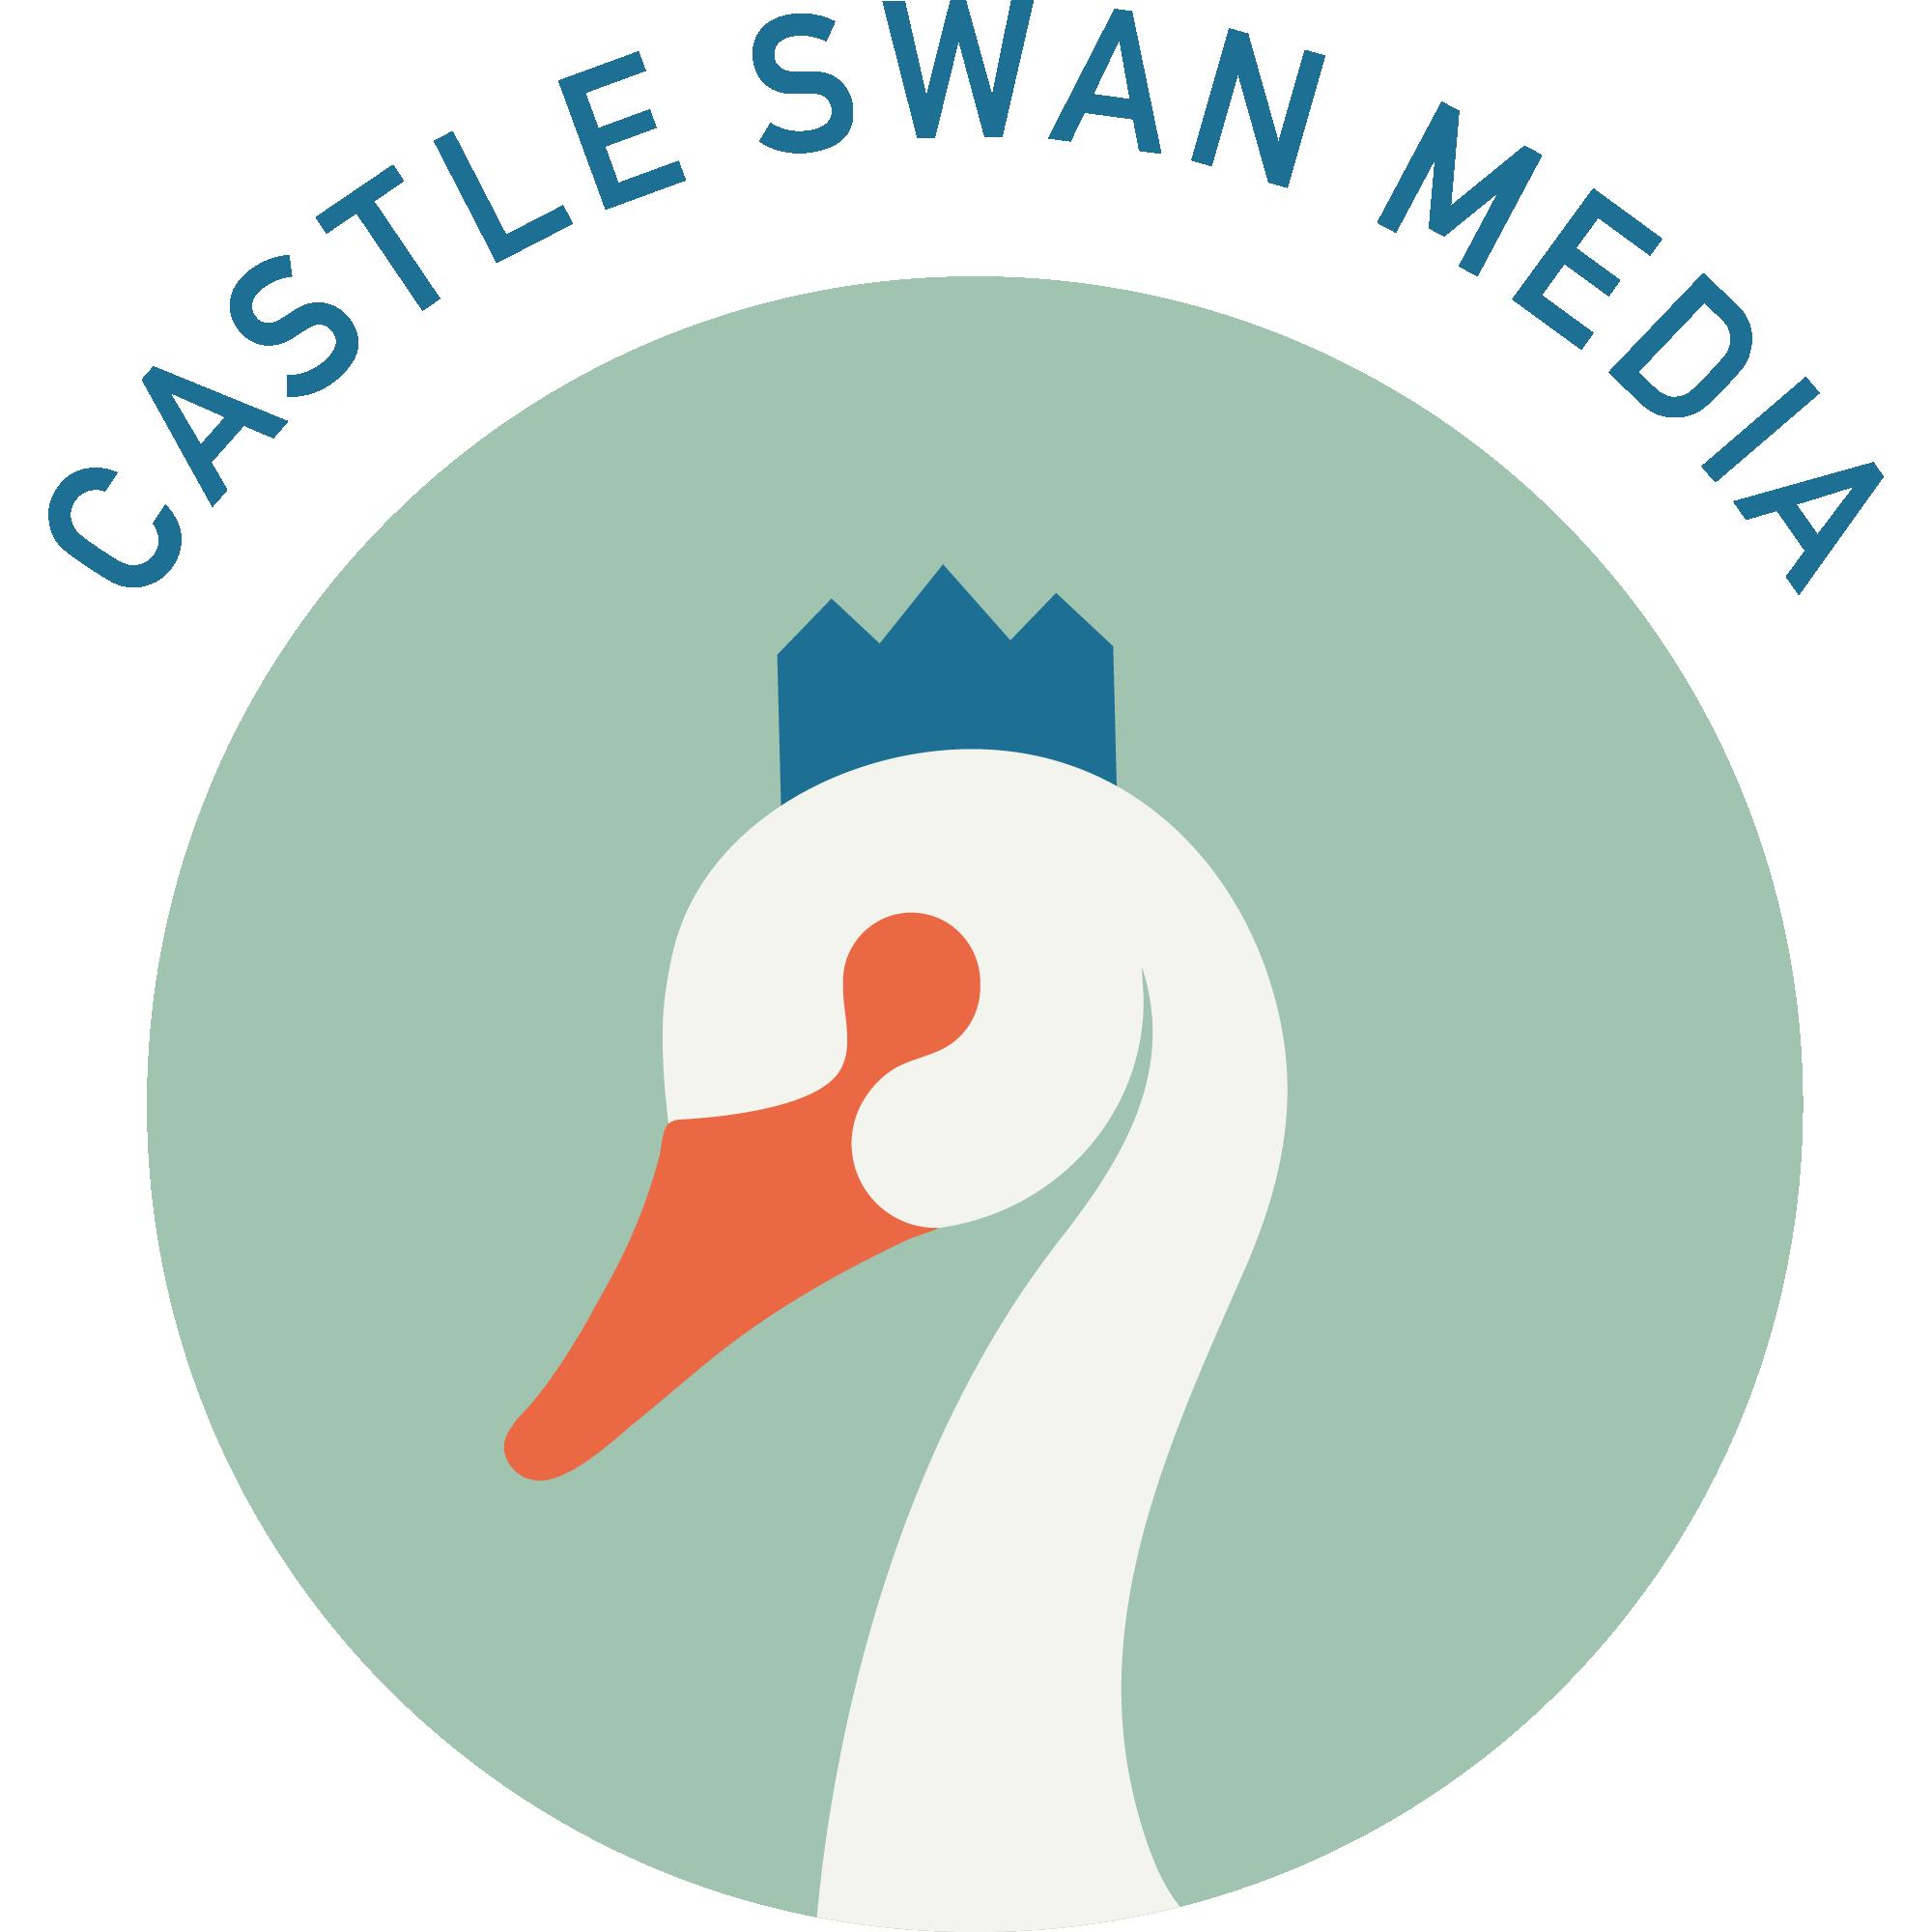 Castle Swan Media Logo